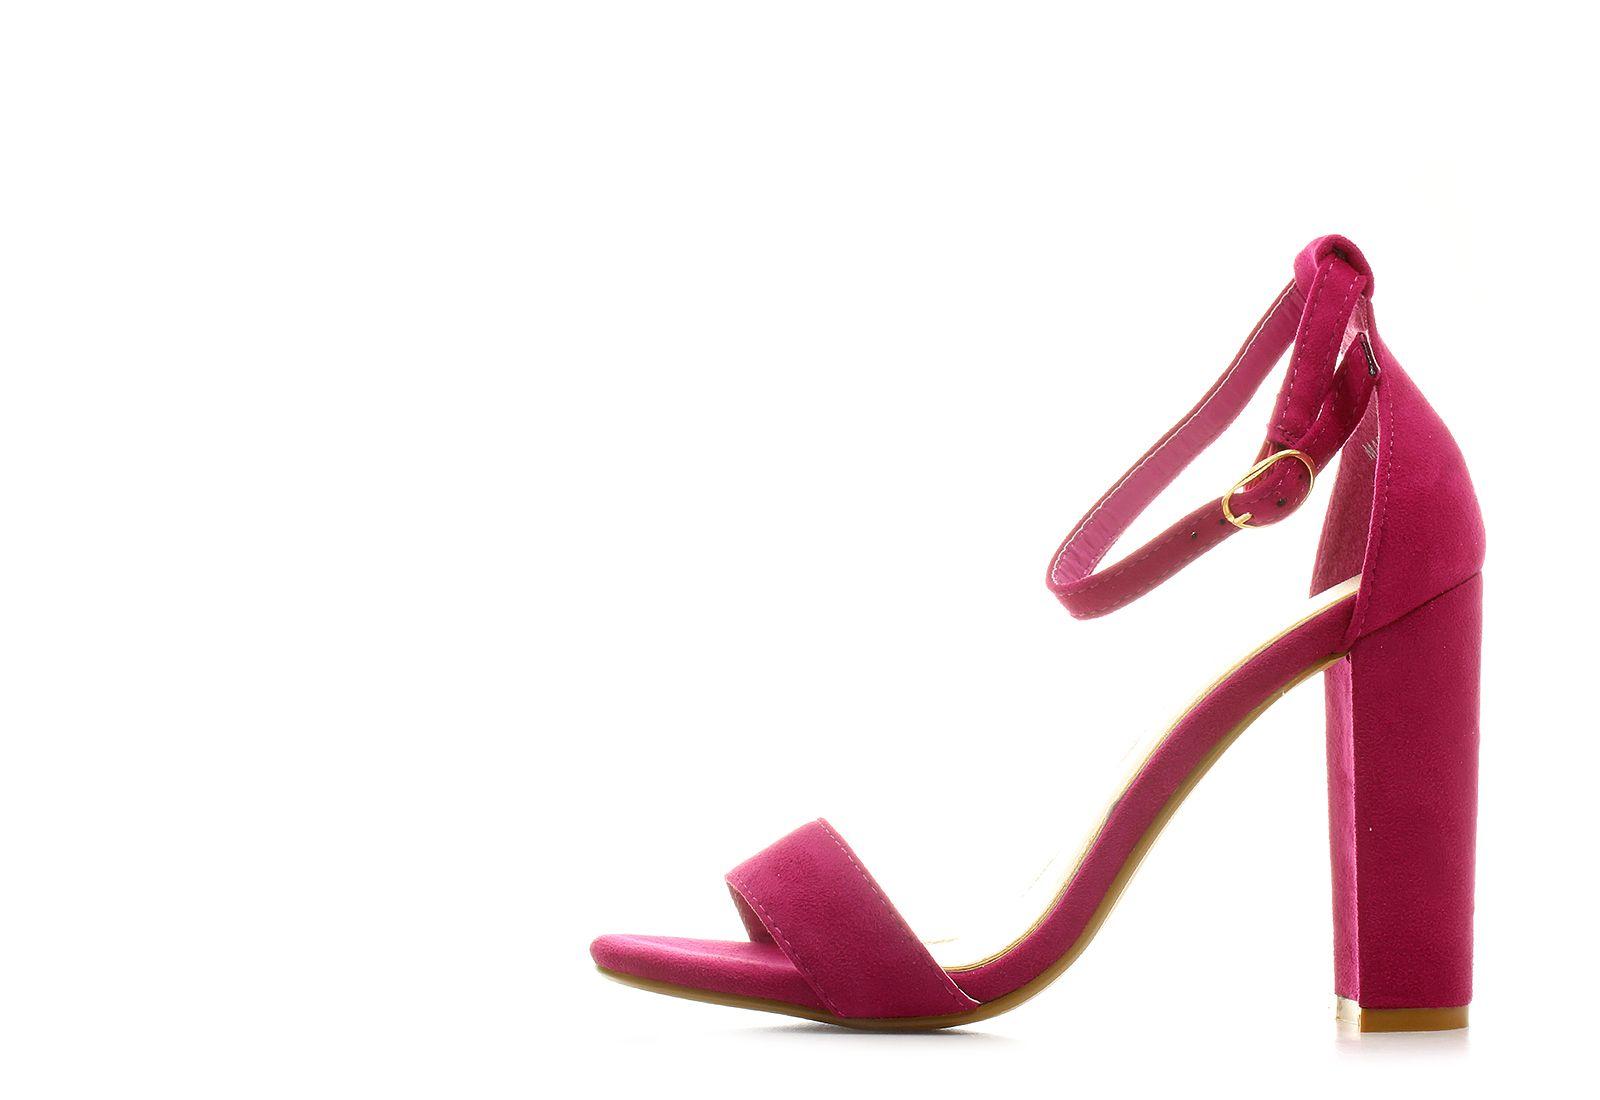 Kitten High Heels - Maracuja - maracuja-fus - Online shop for ...